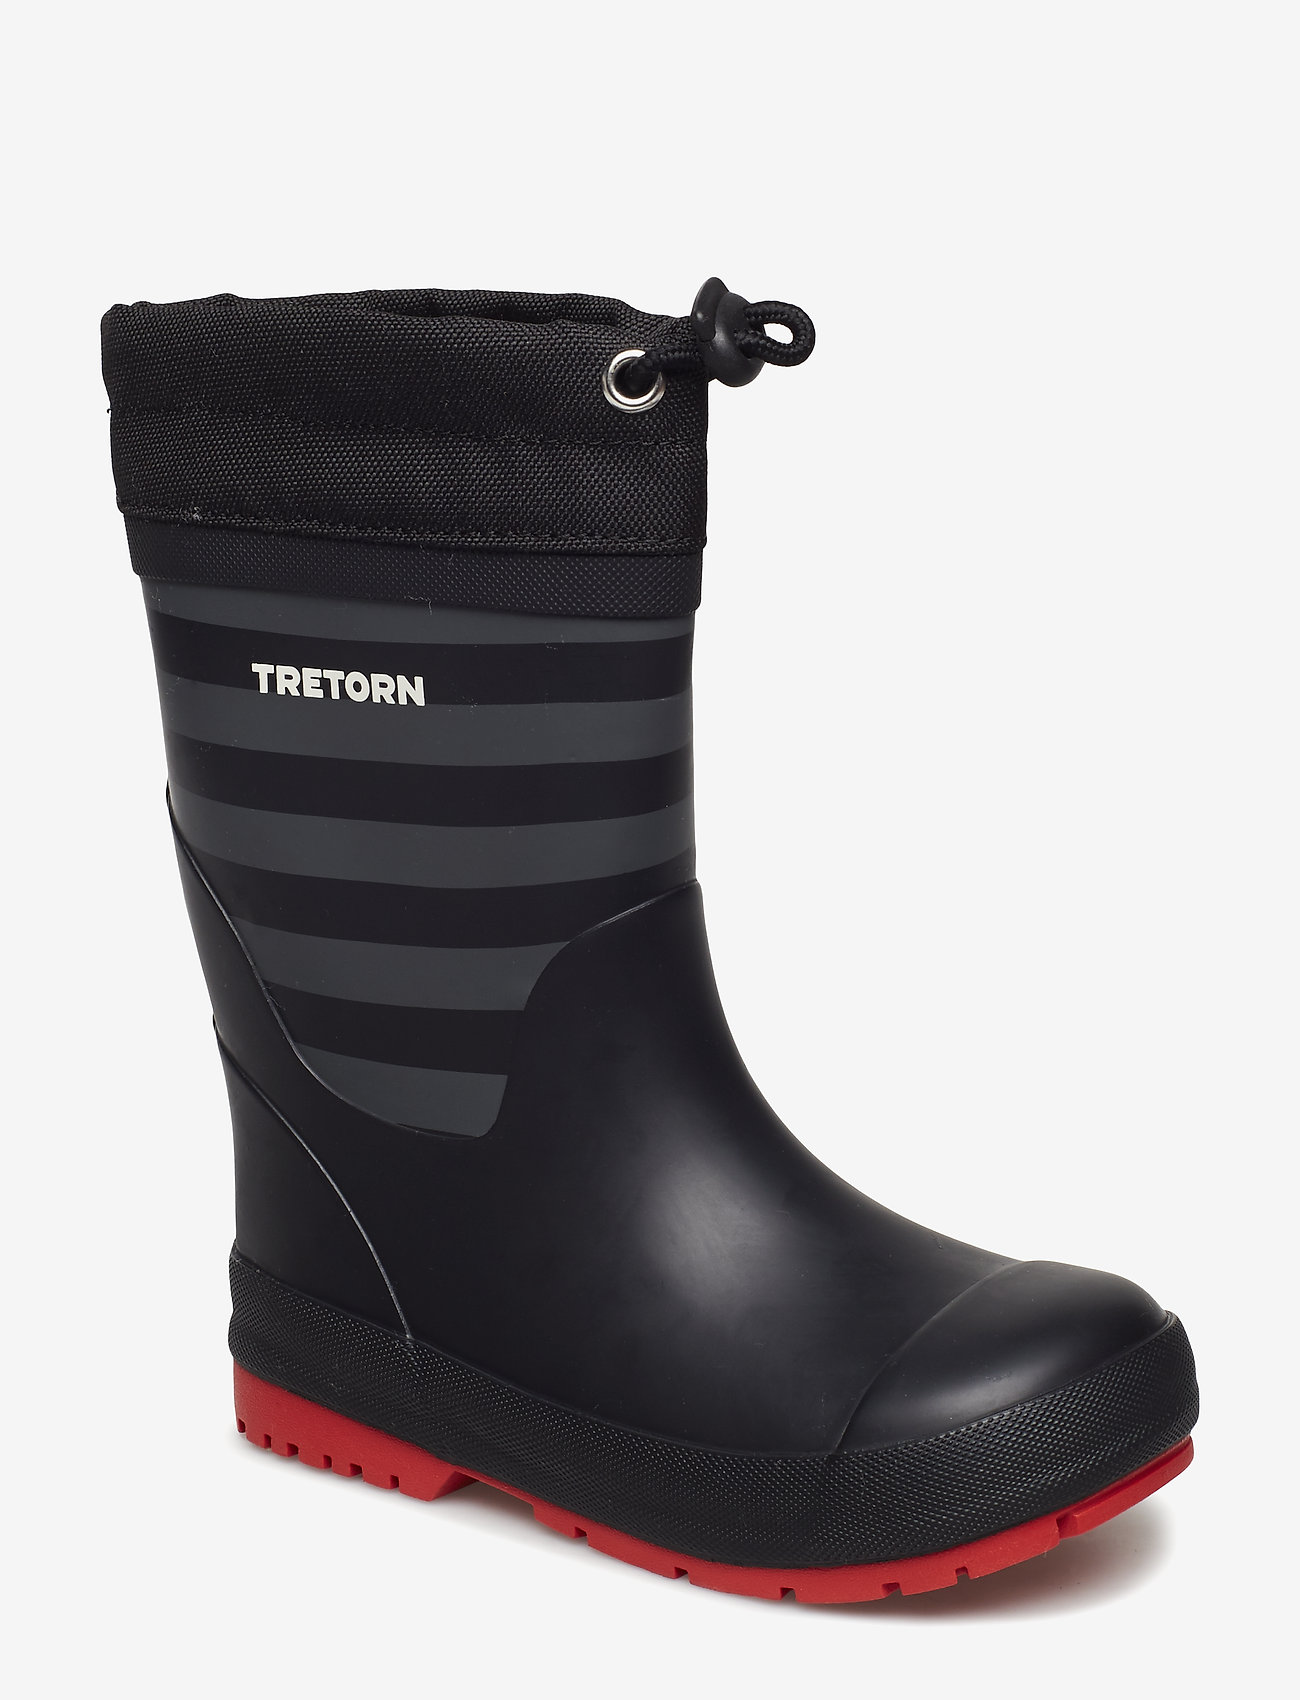 Tretorn - GRNNA VINTER - gumowce ocieplane - black/grey - 0